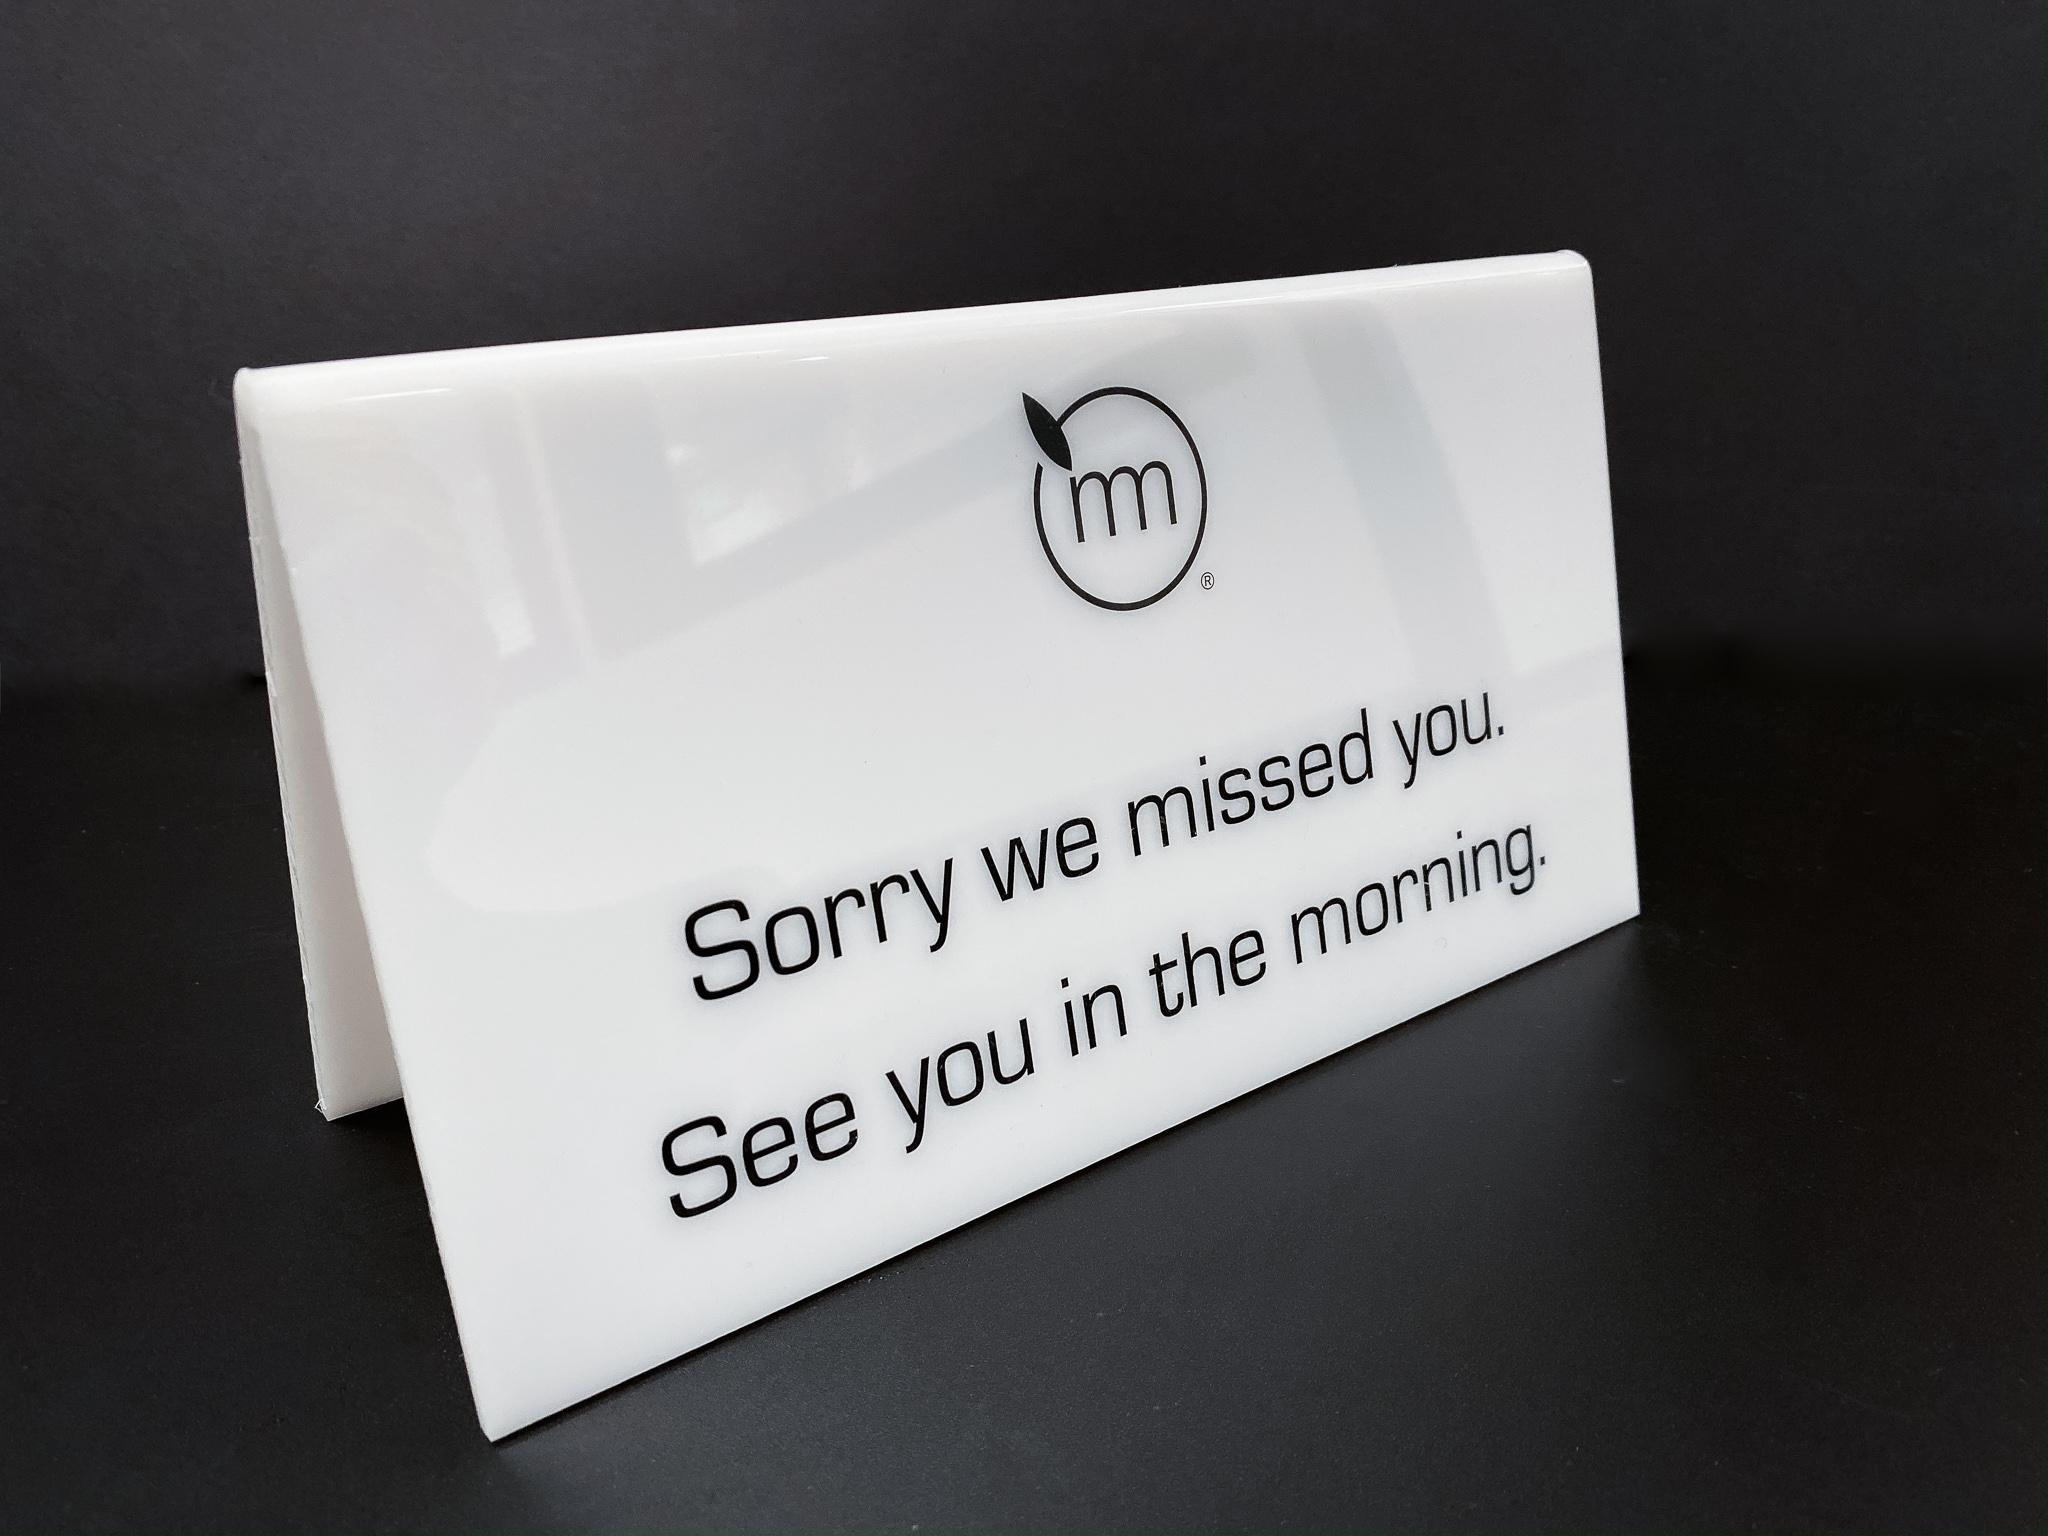 Acrylic displays sign